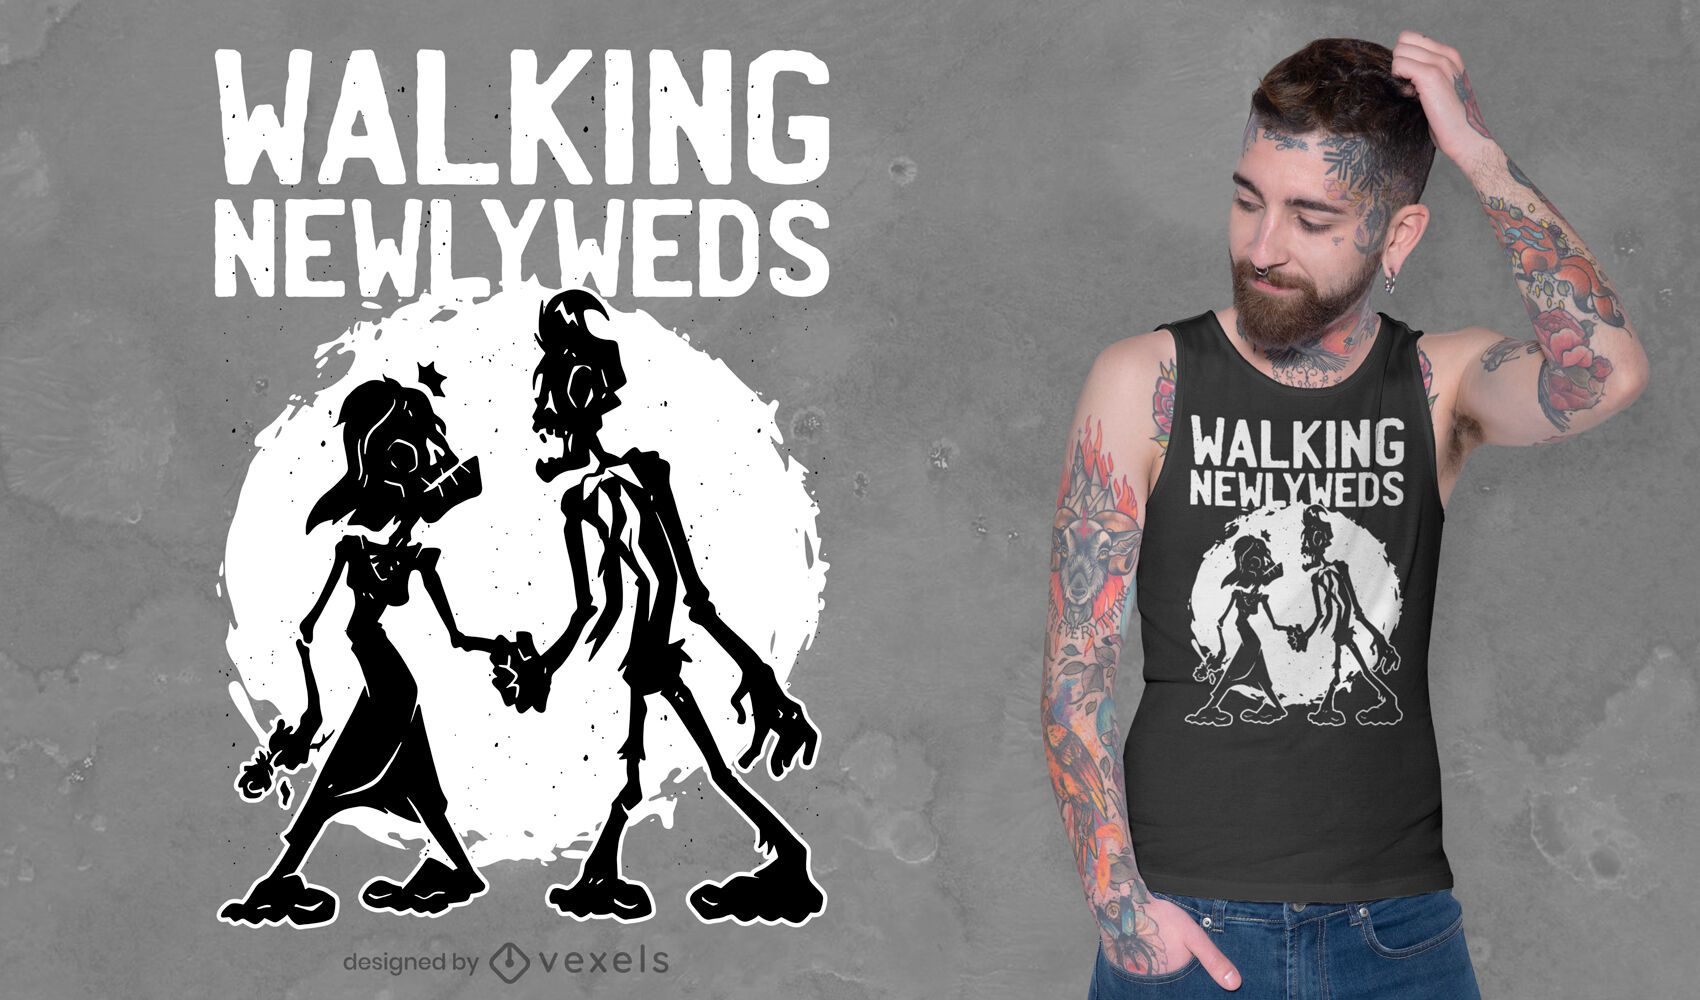 Walking newlyweds t-shirt design